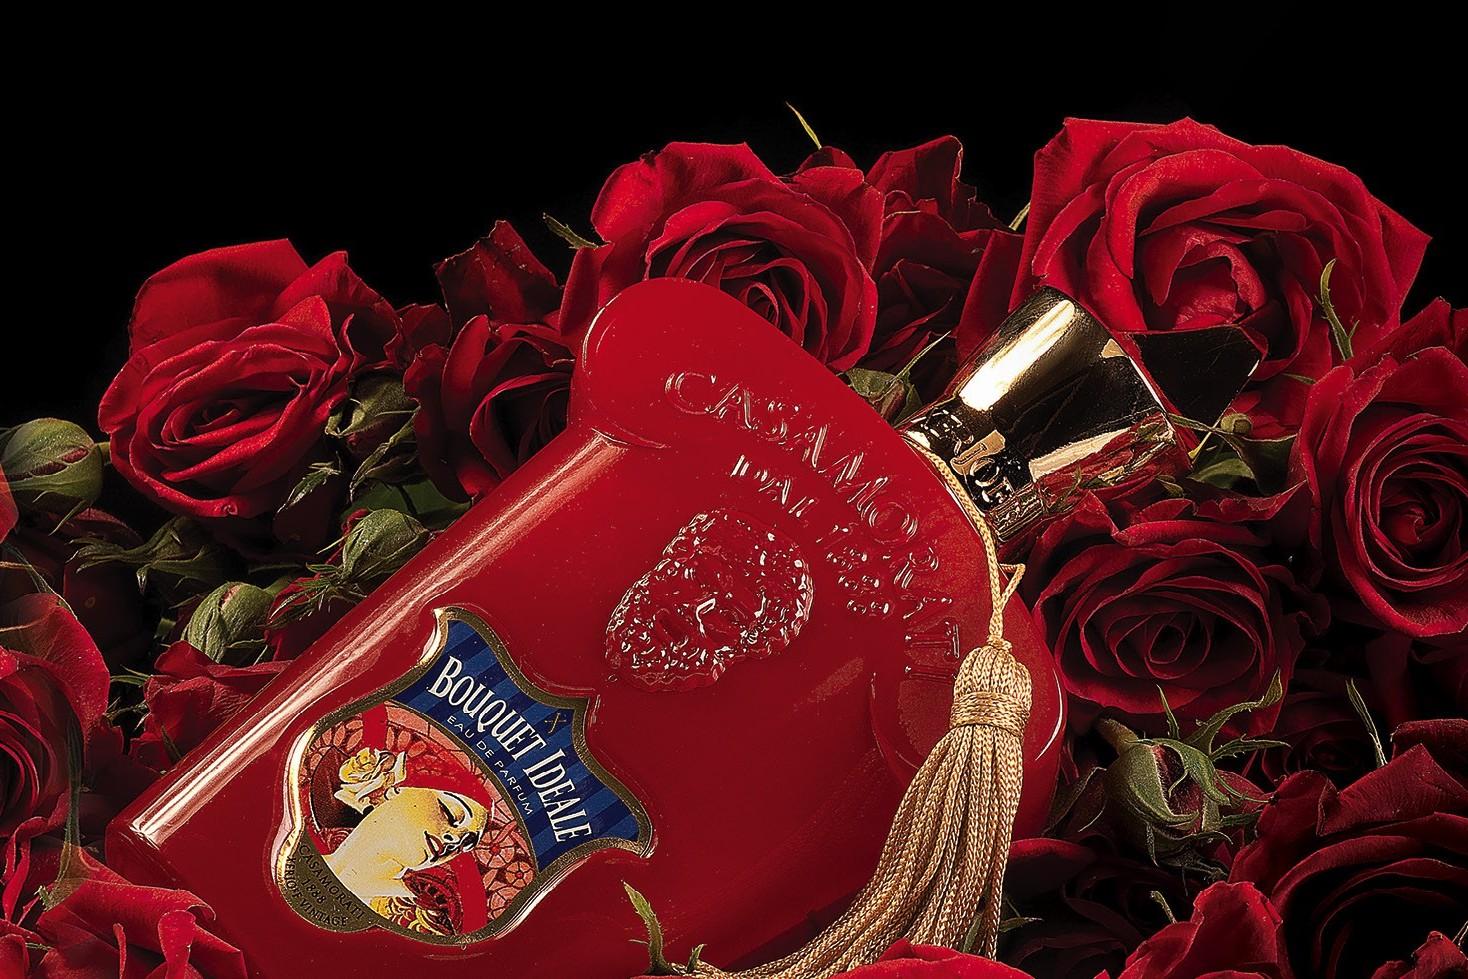 casamorati-xerjoff-bouquet-ideale